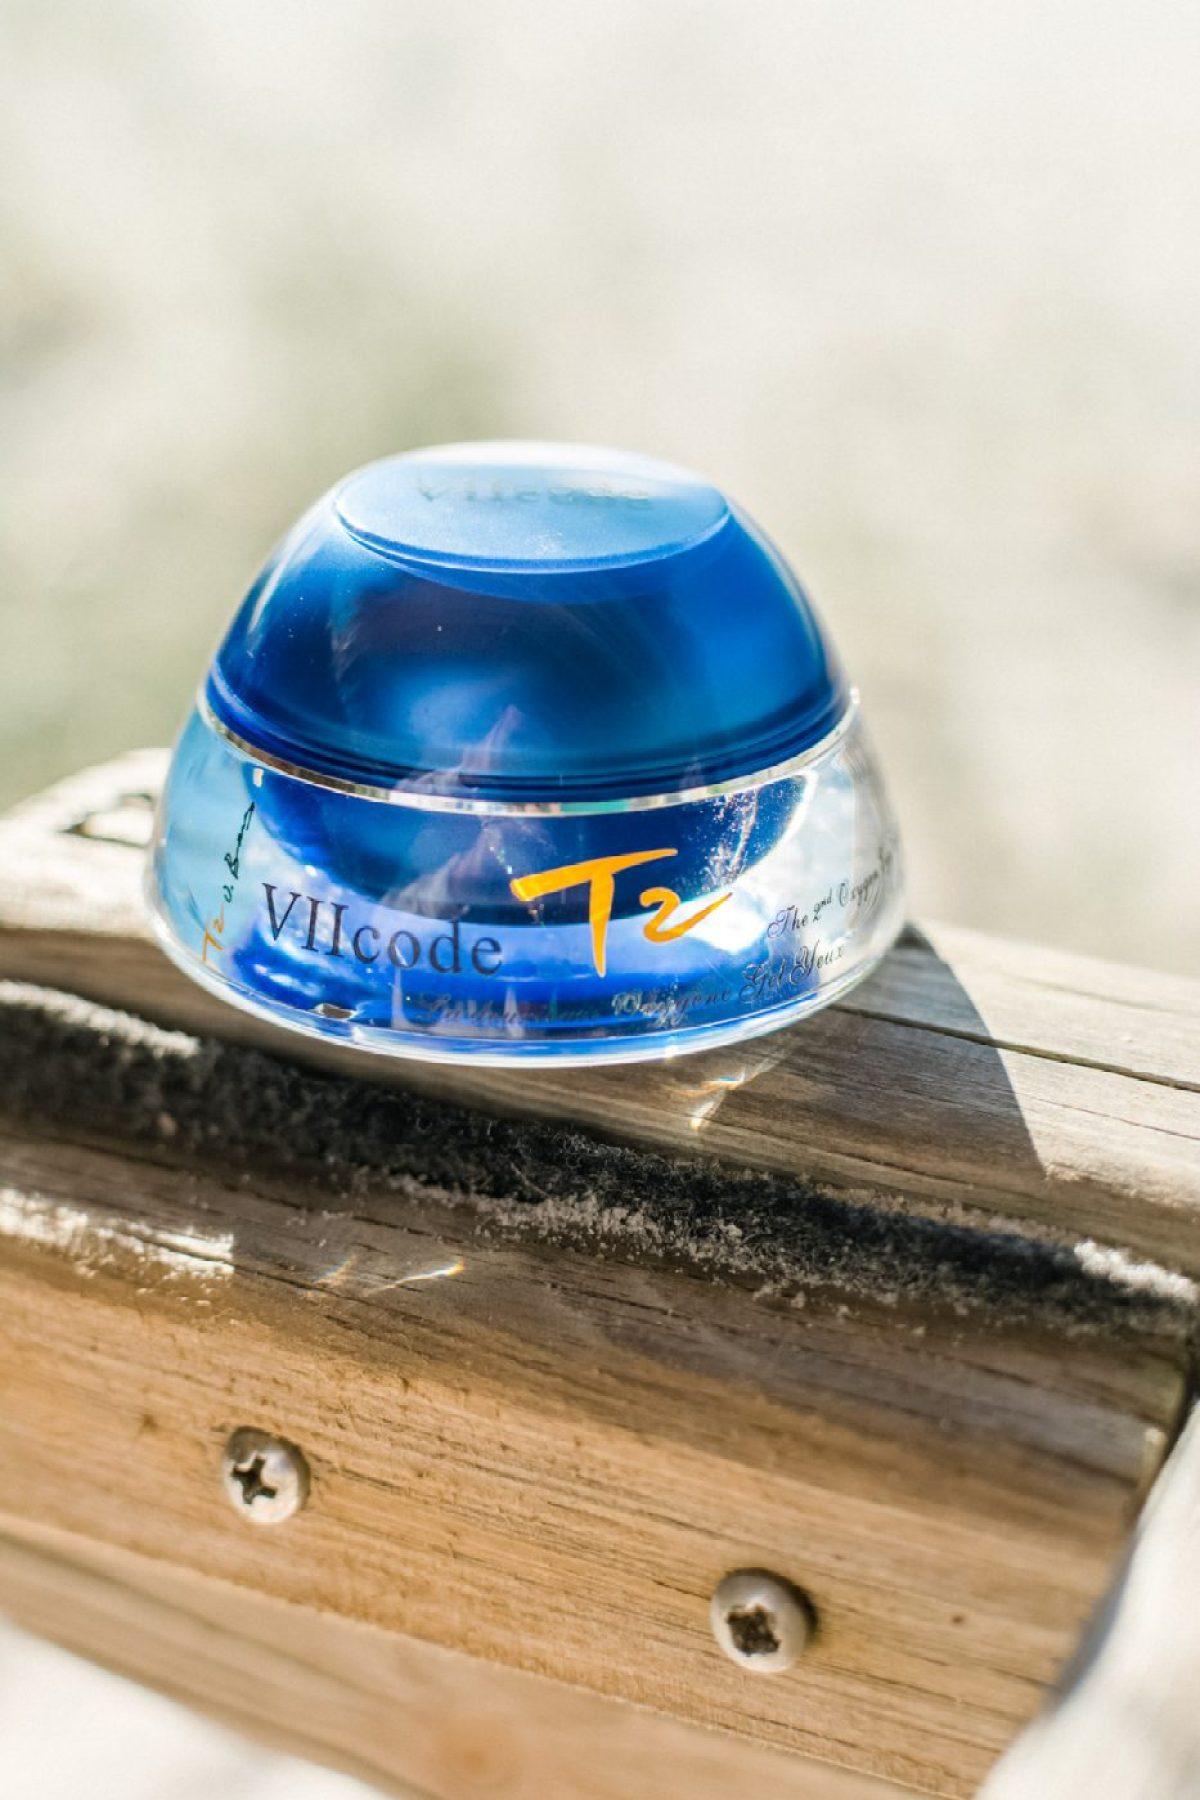 VIICODE T2 Oxygen Eye Cream Review - Sweet Teal